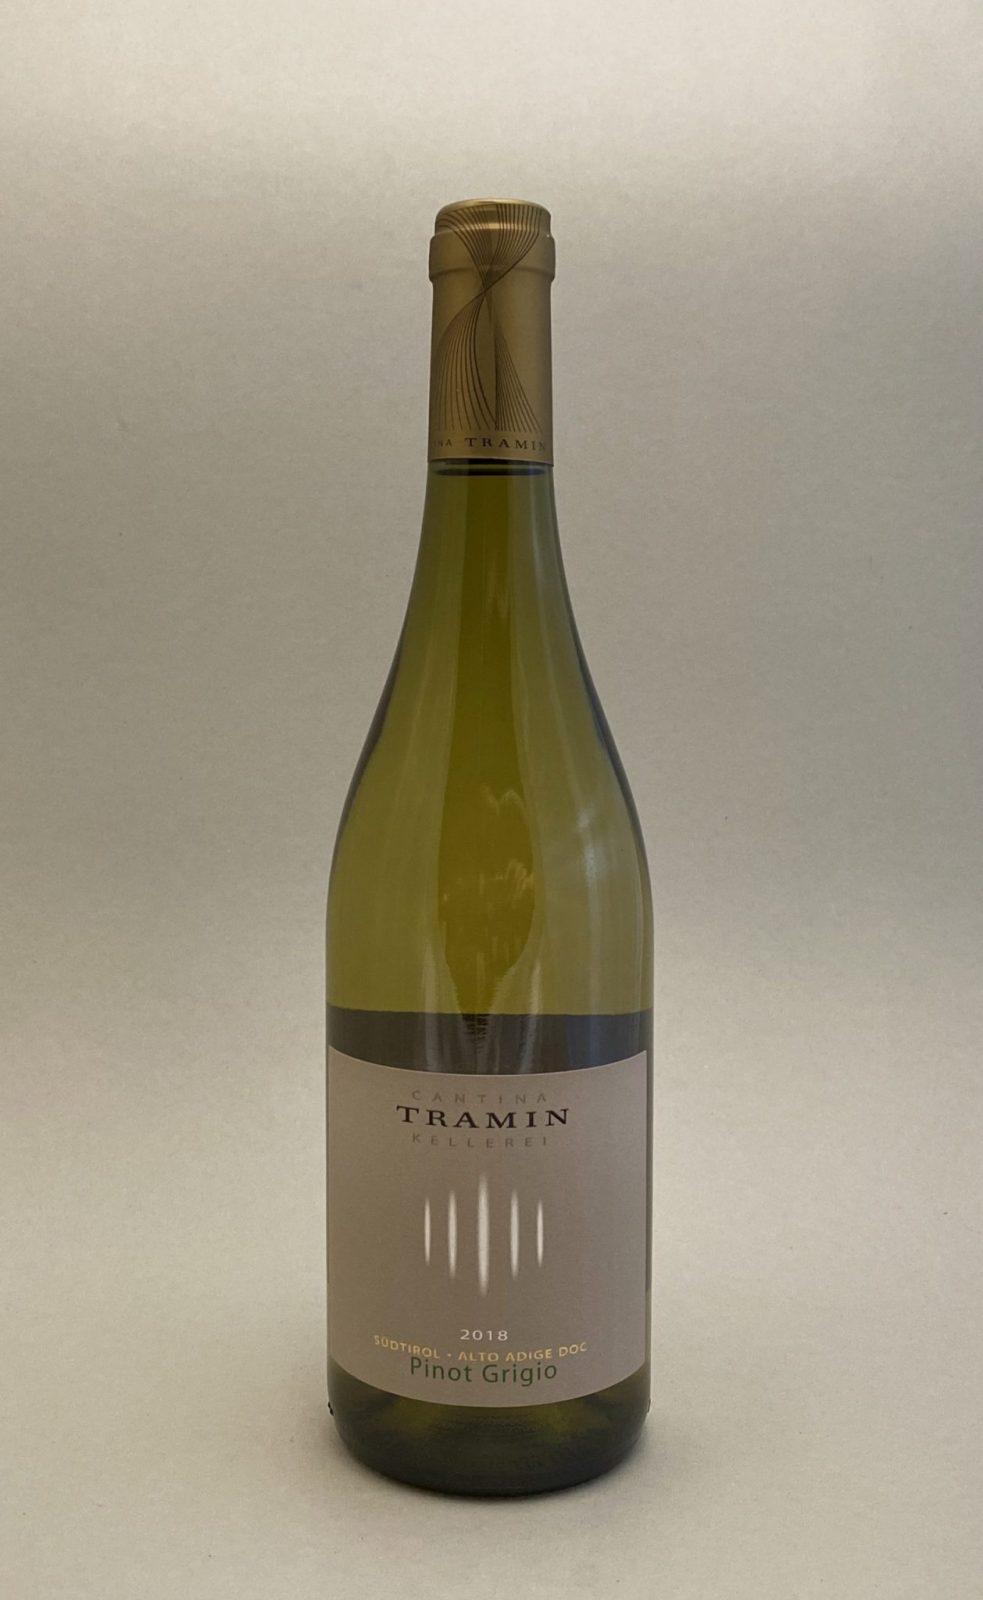 TRAMIN Pinot Grigio 2018, vinoteka Sunny wines slnecnice mesto, Bratislava petrzalka, vino biele z Talianska